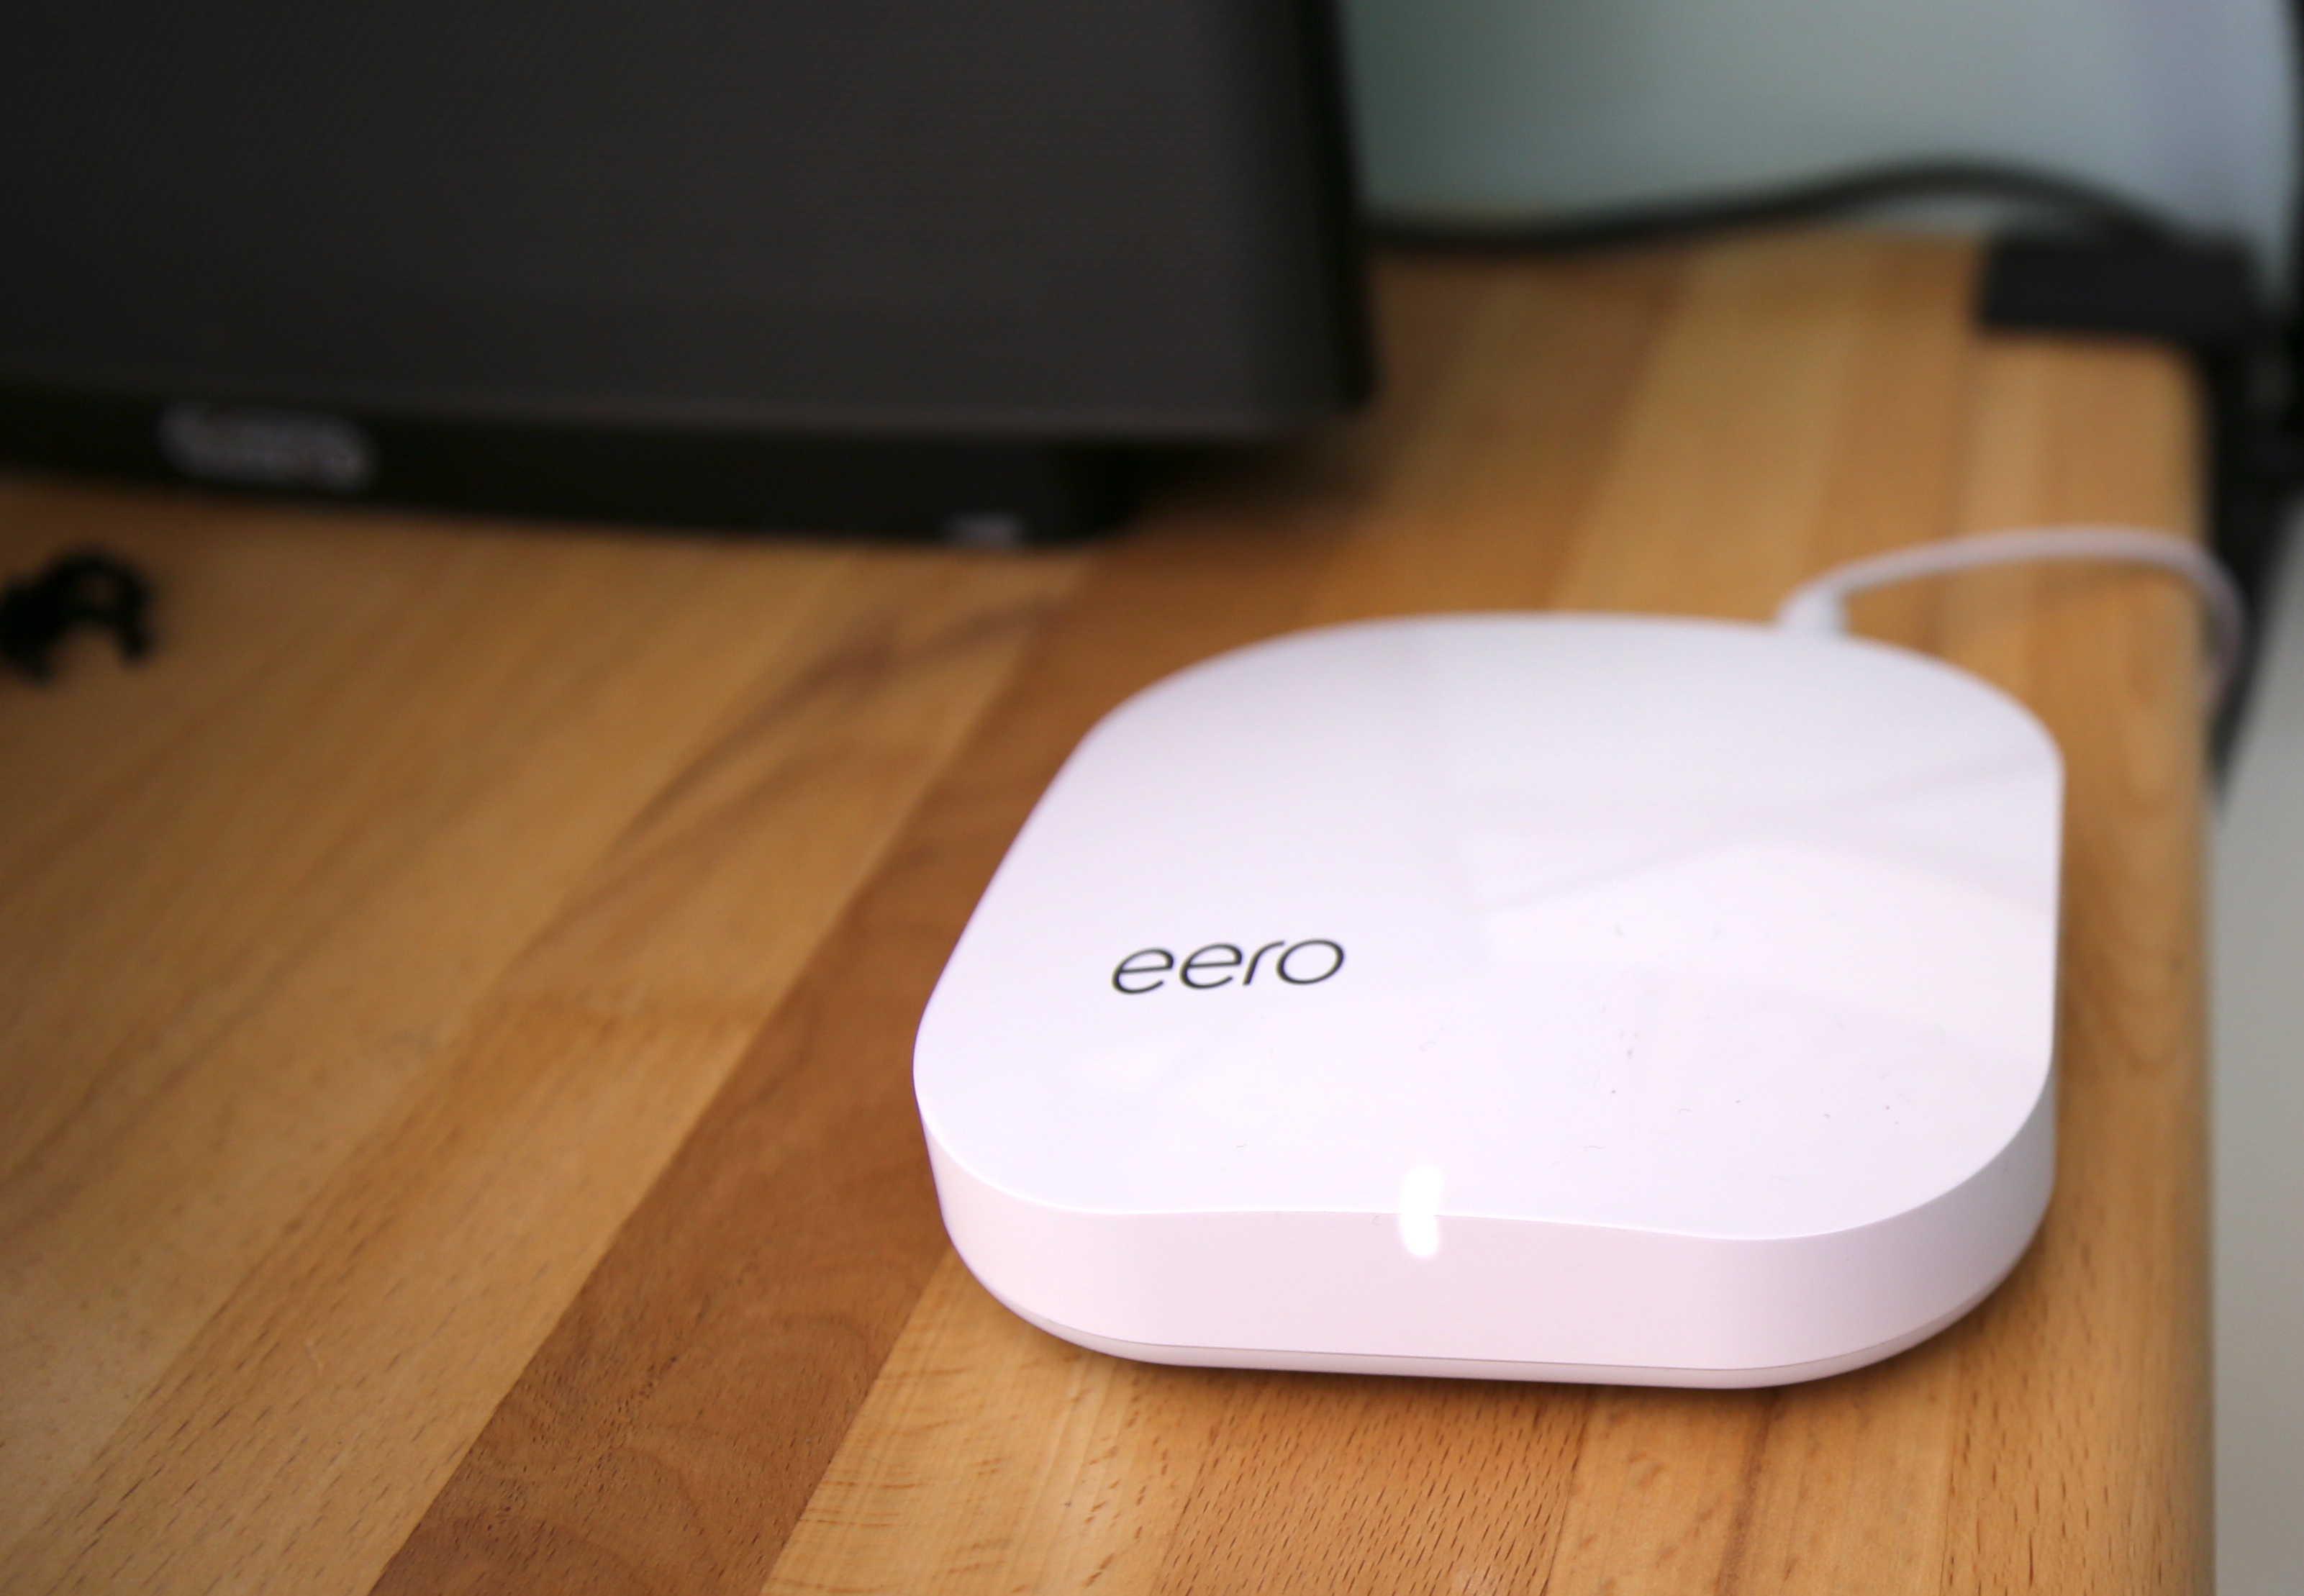 Eero_WiFi_router_05_16_2016_1